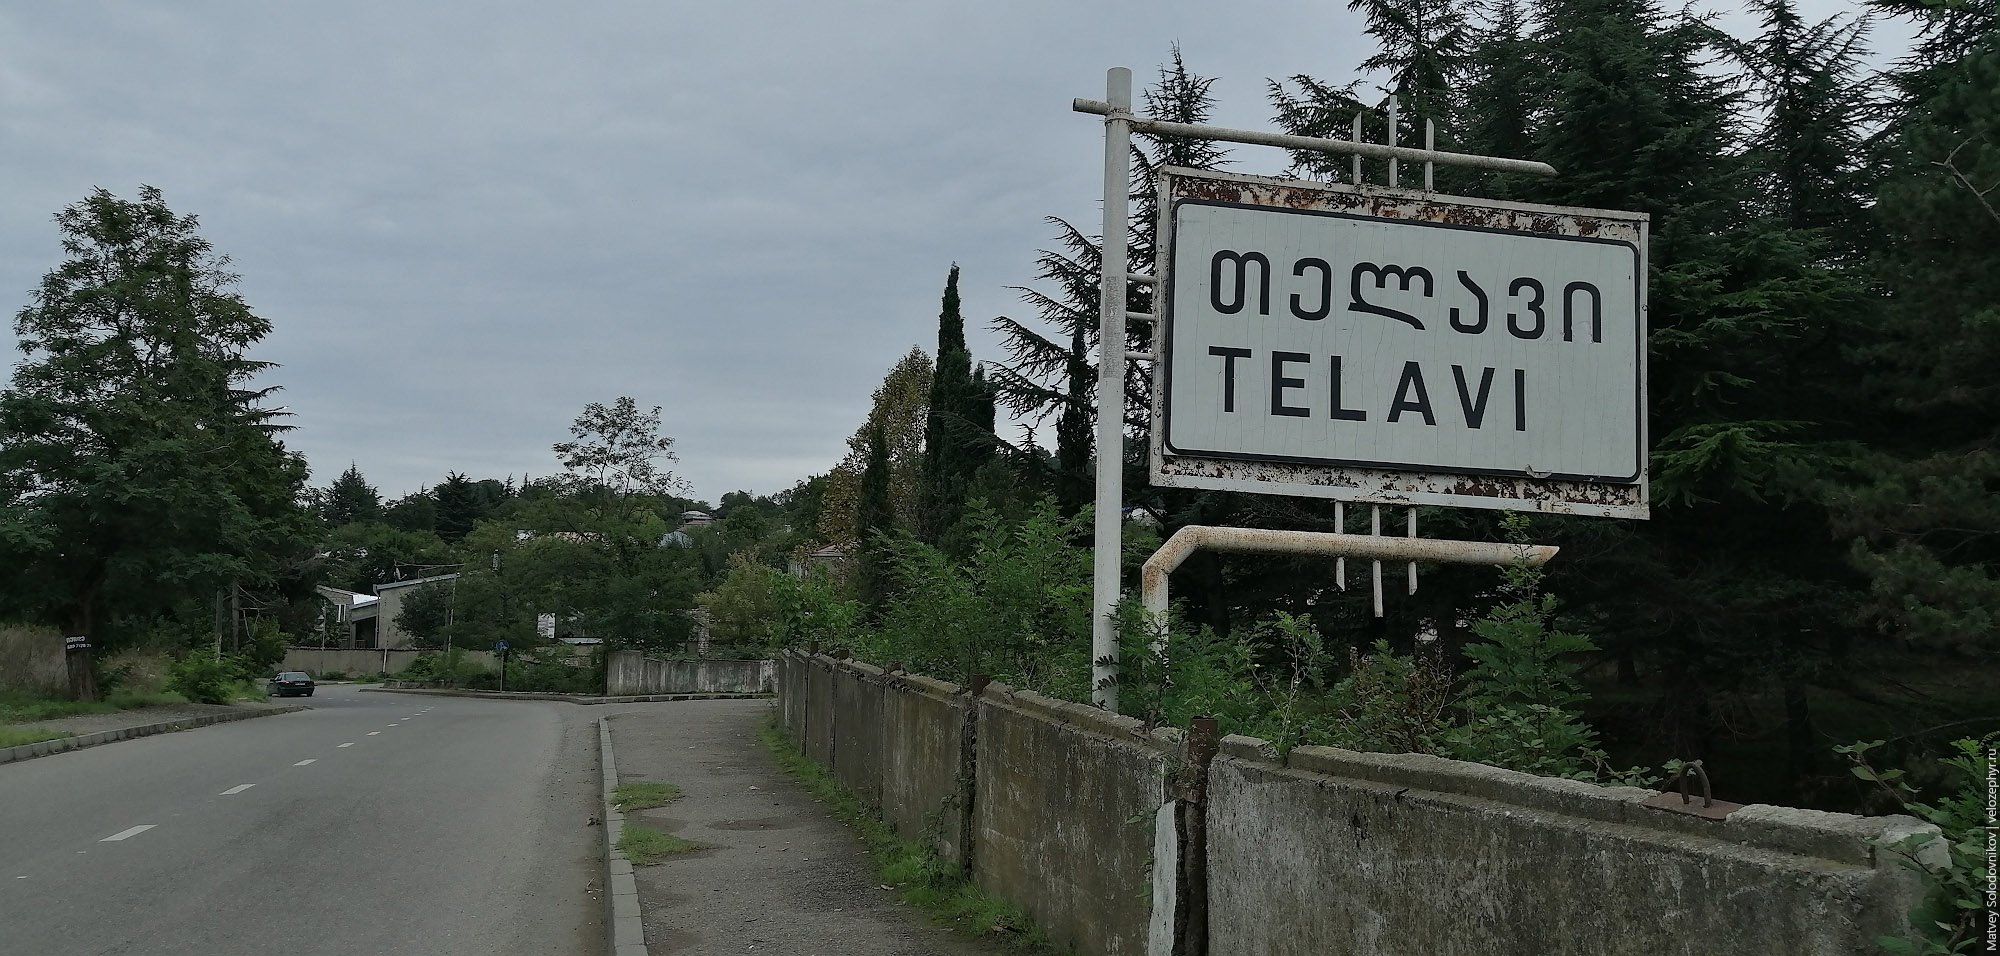 Въезжаю в Телави